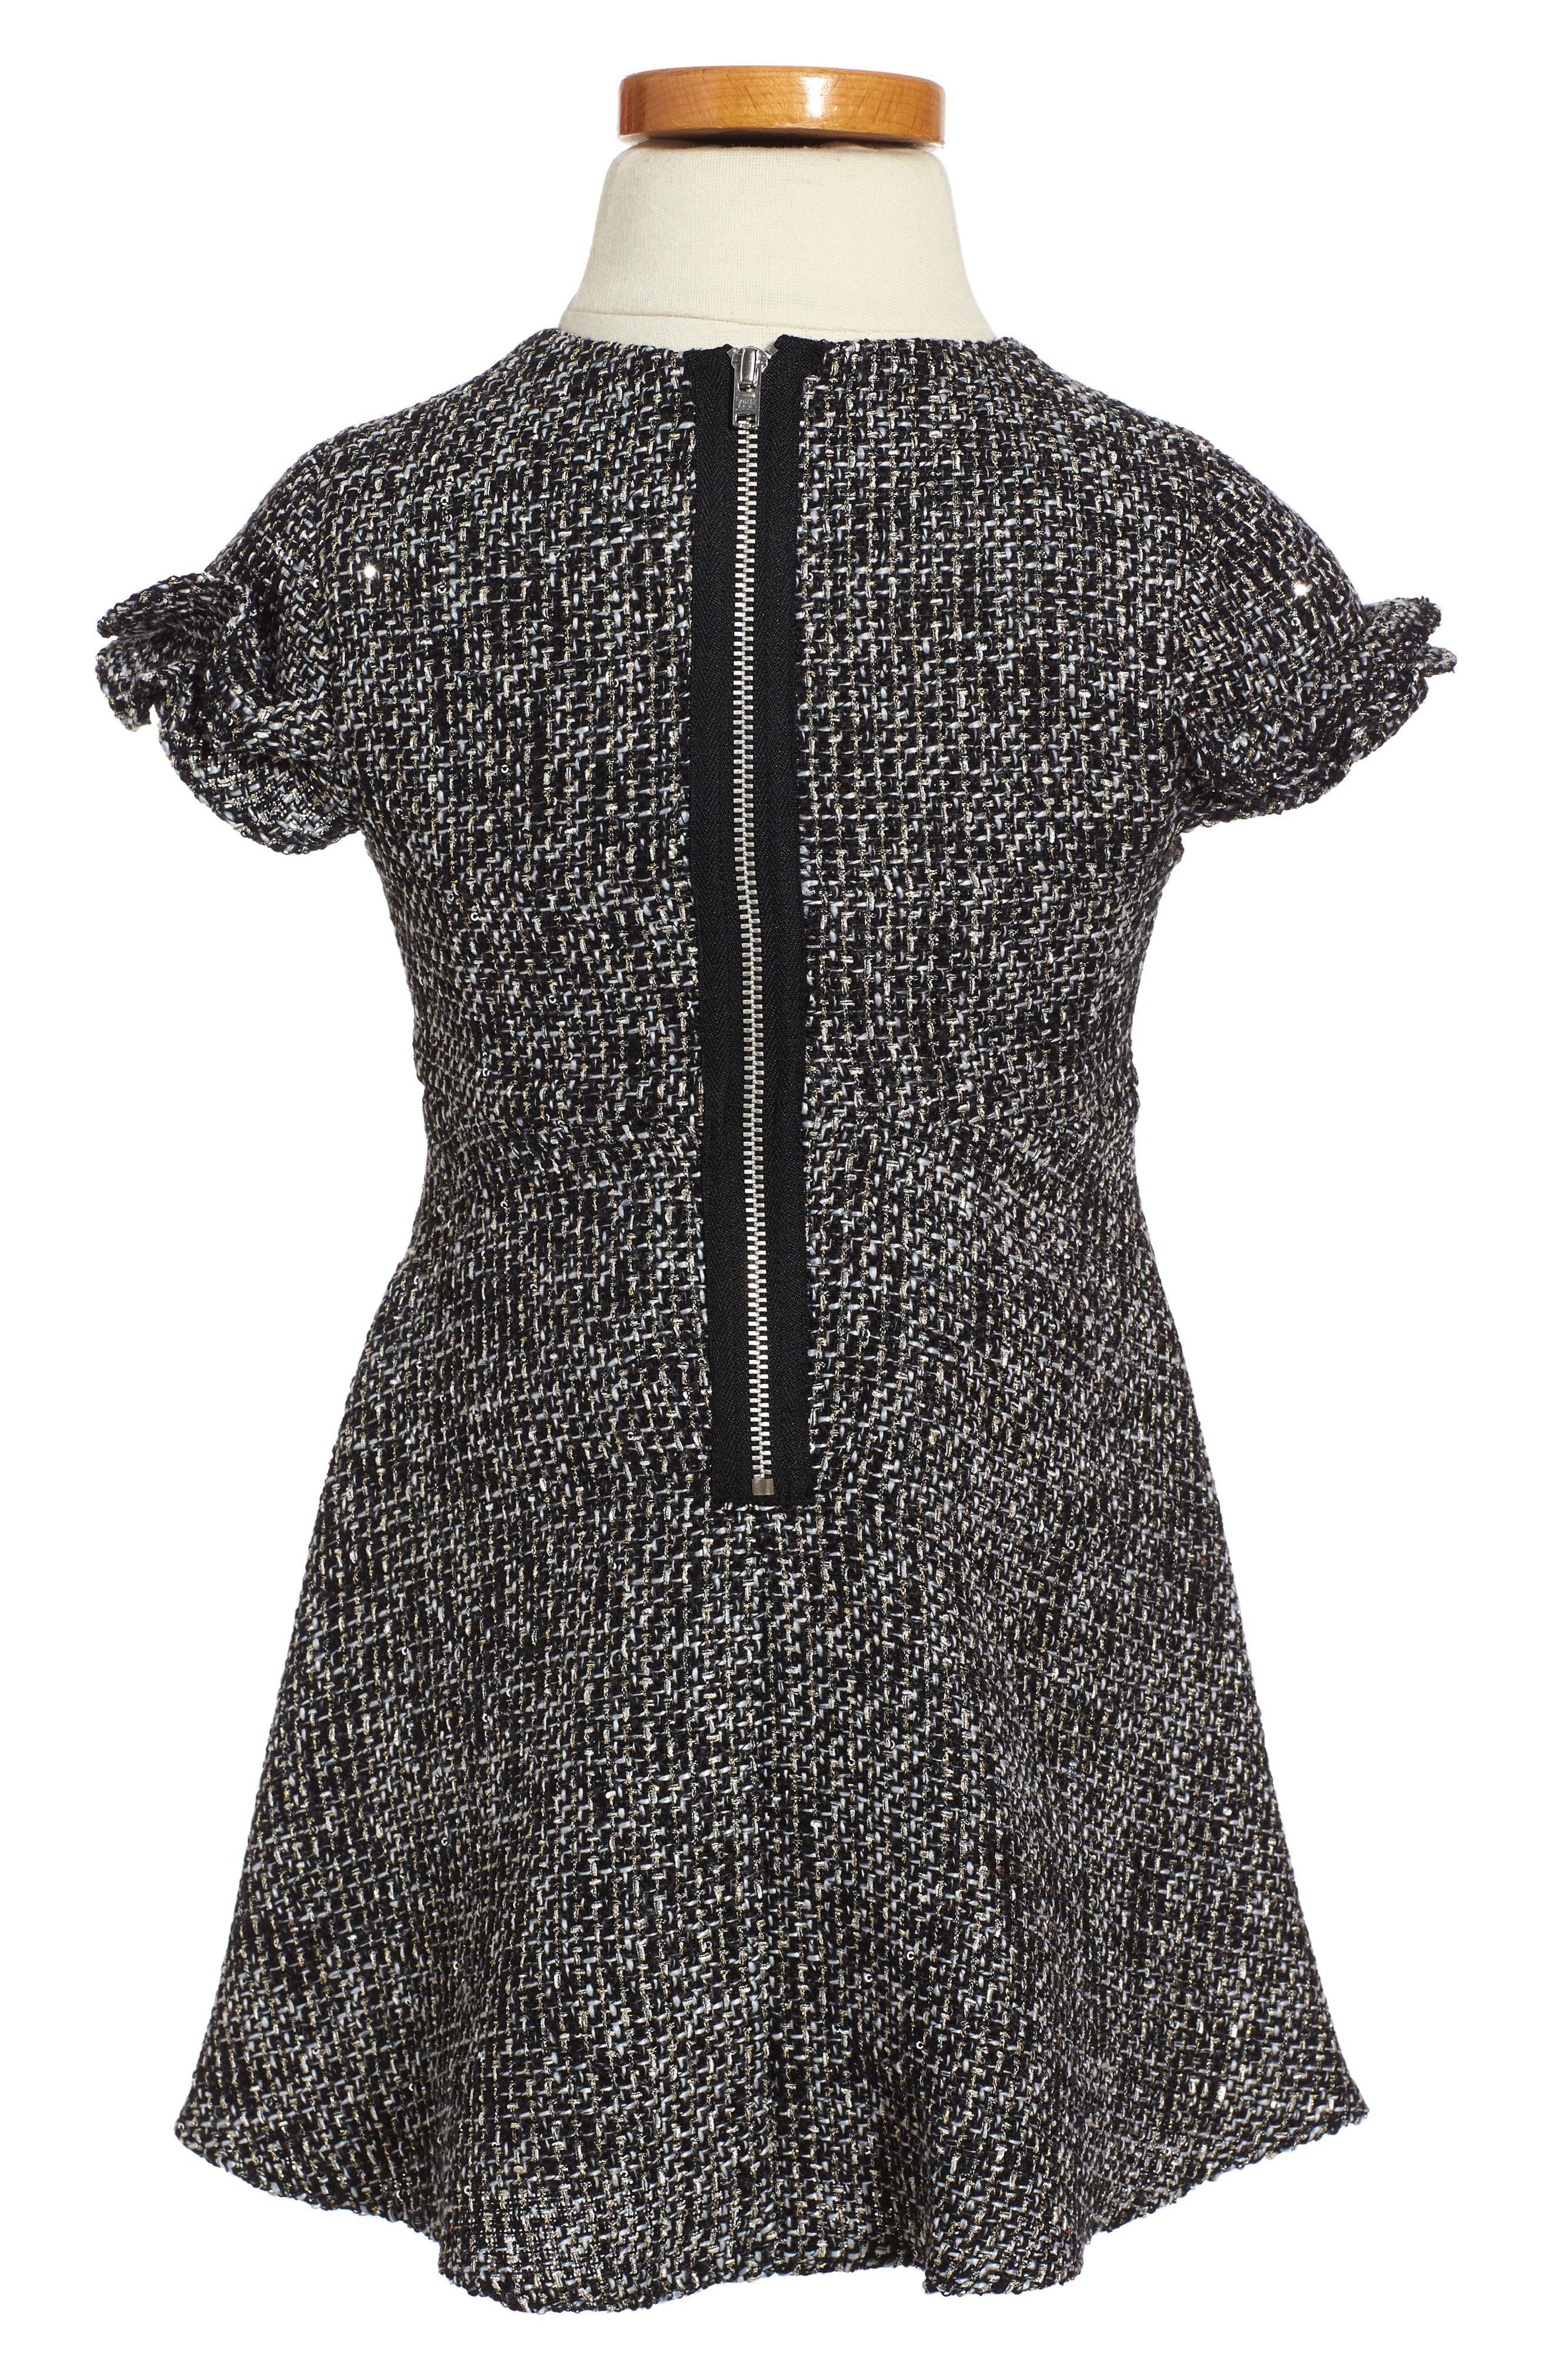 Alternate Image 2  - David Charles Sequin Tweed Dress (Toddler Girls & Little Girls)